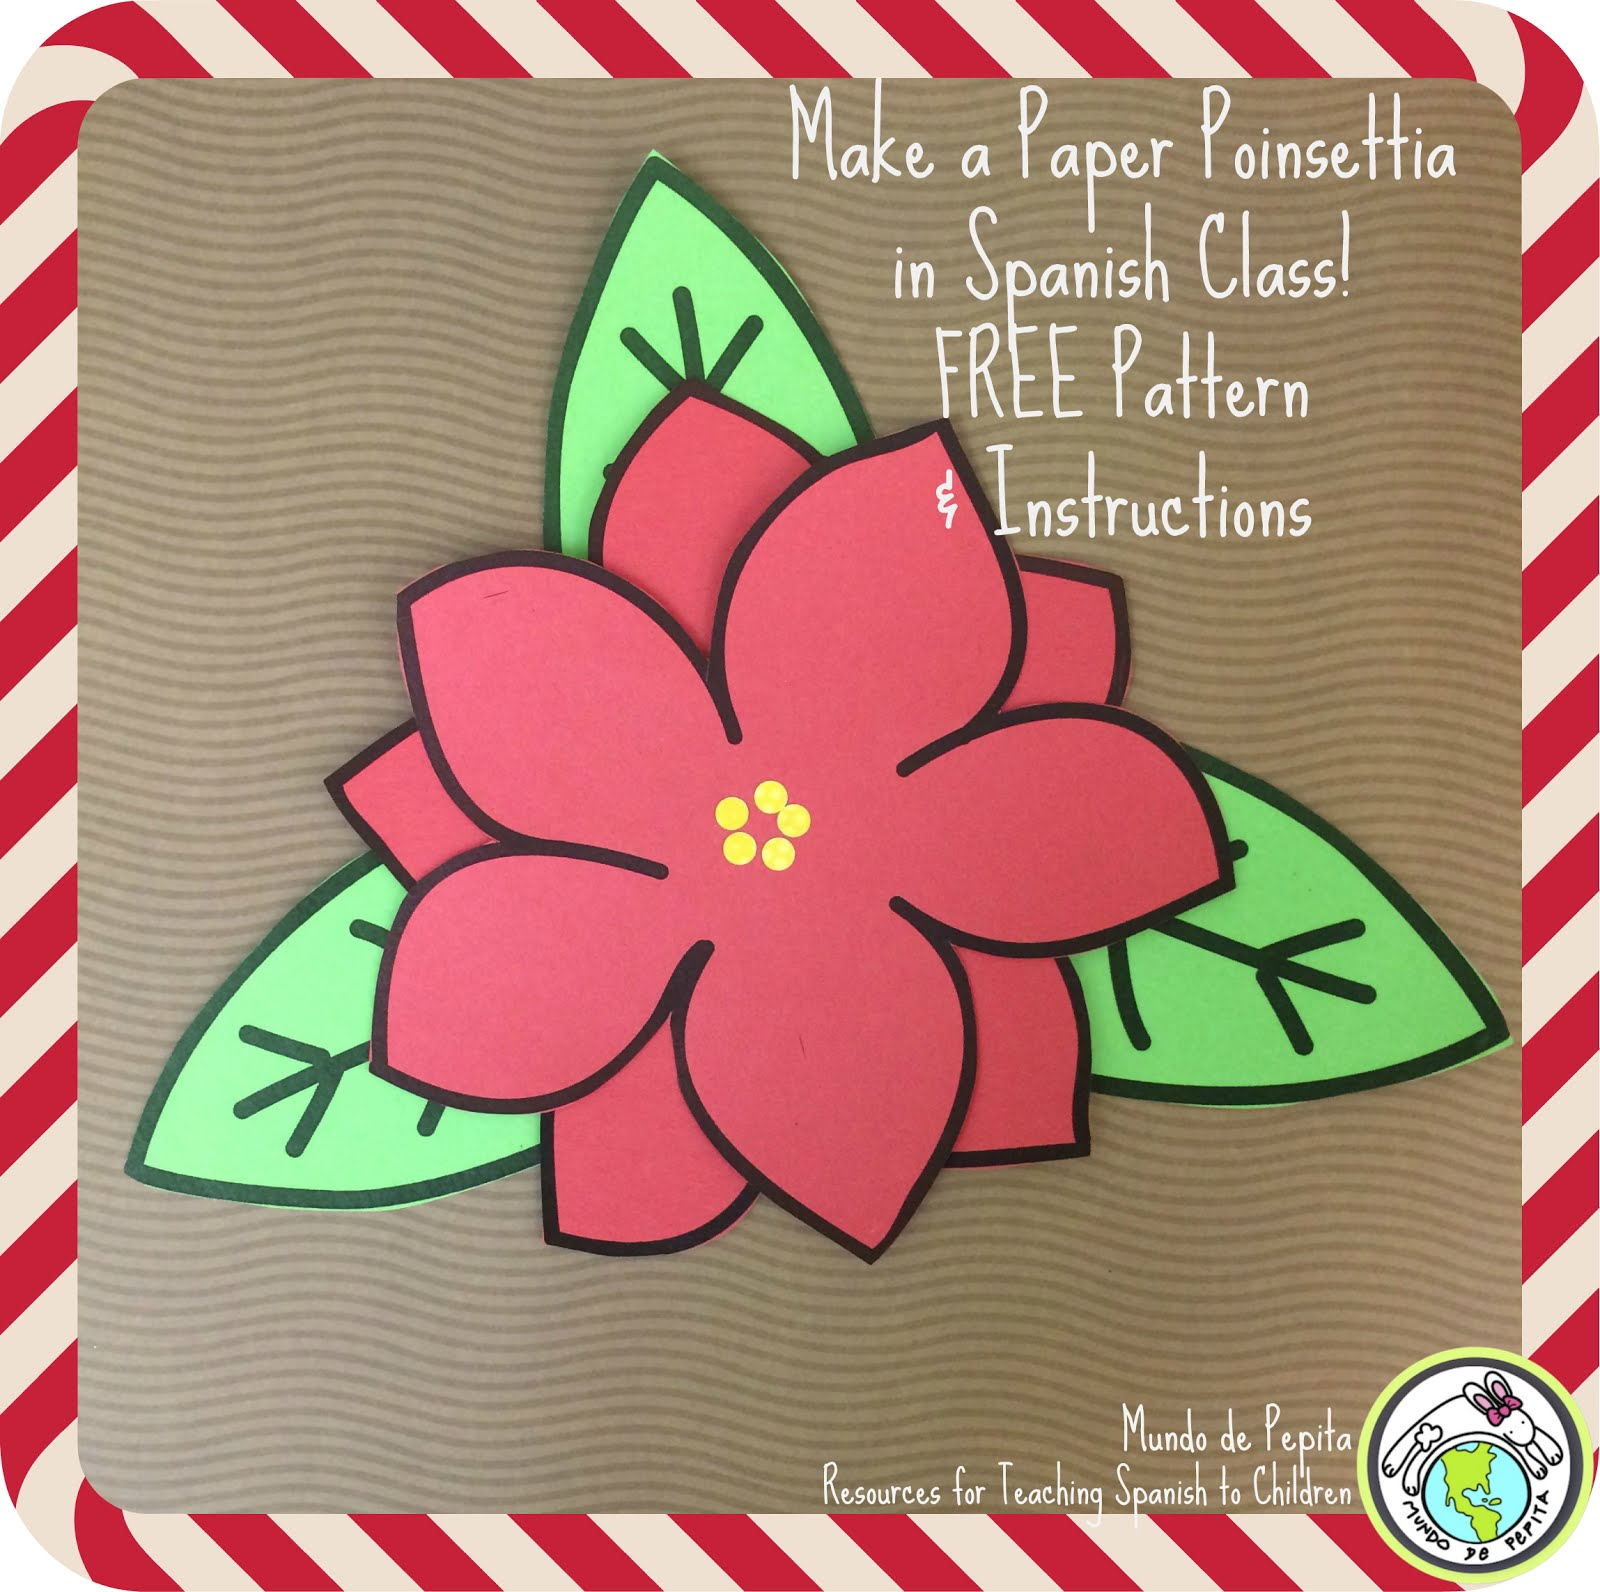 Paper Poinsettia Craft for Spanish Class | Mundo de Pepita